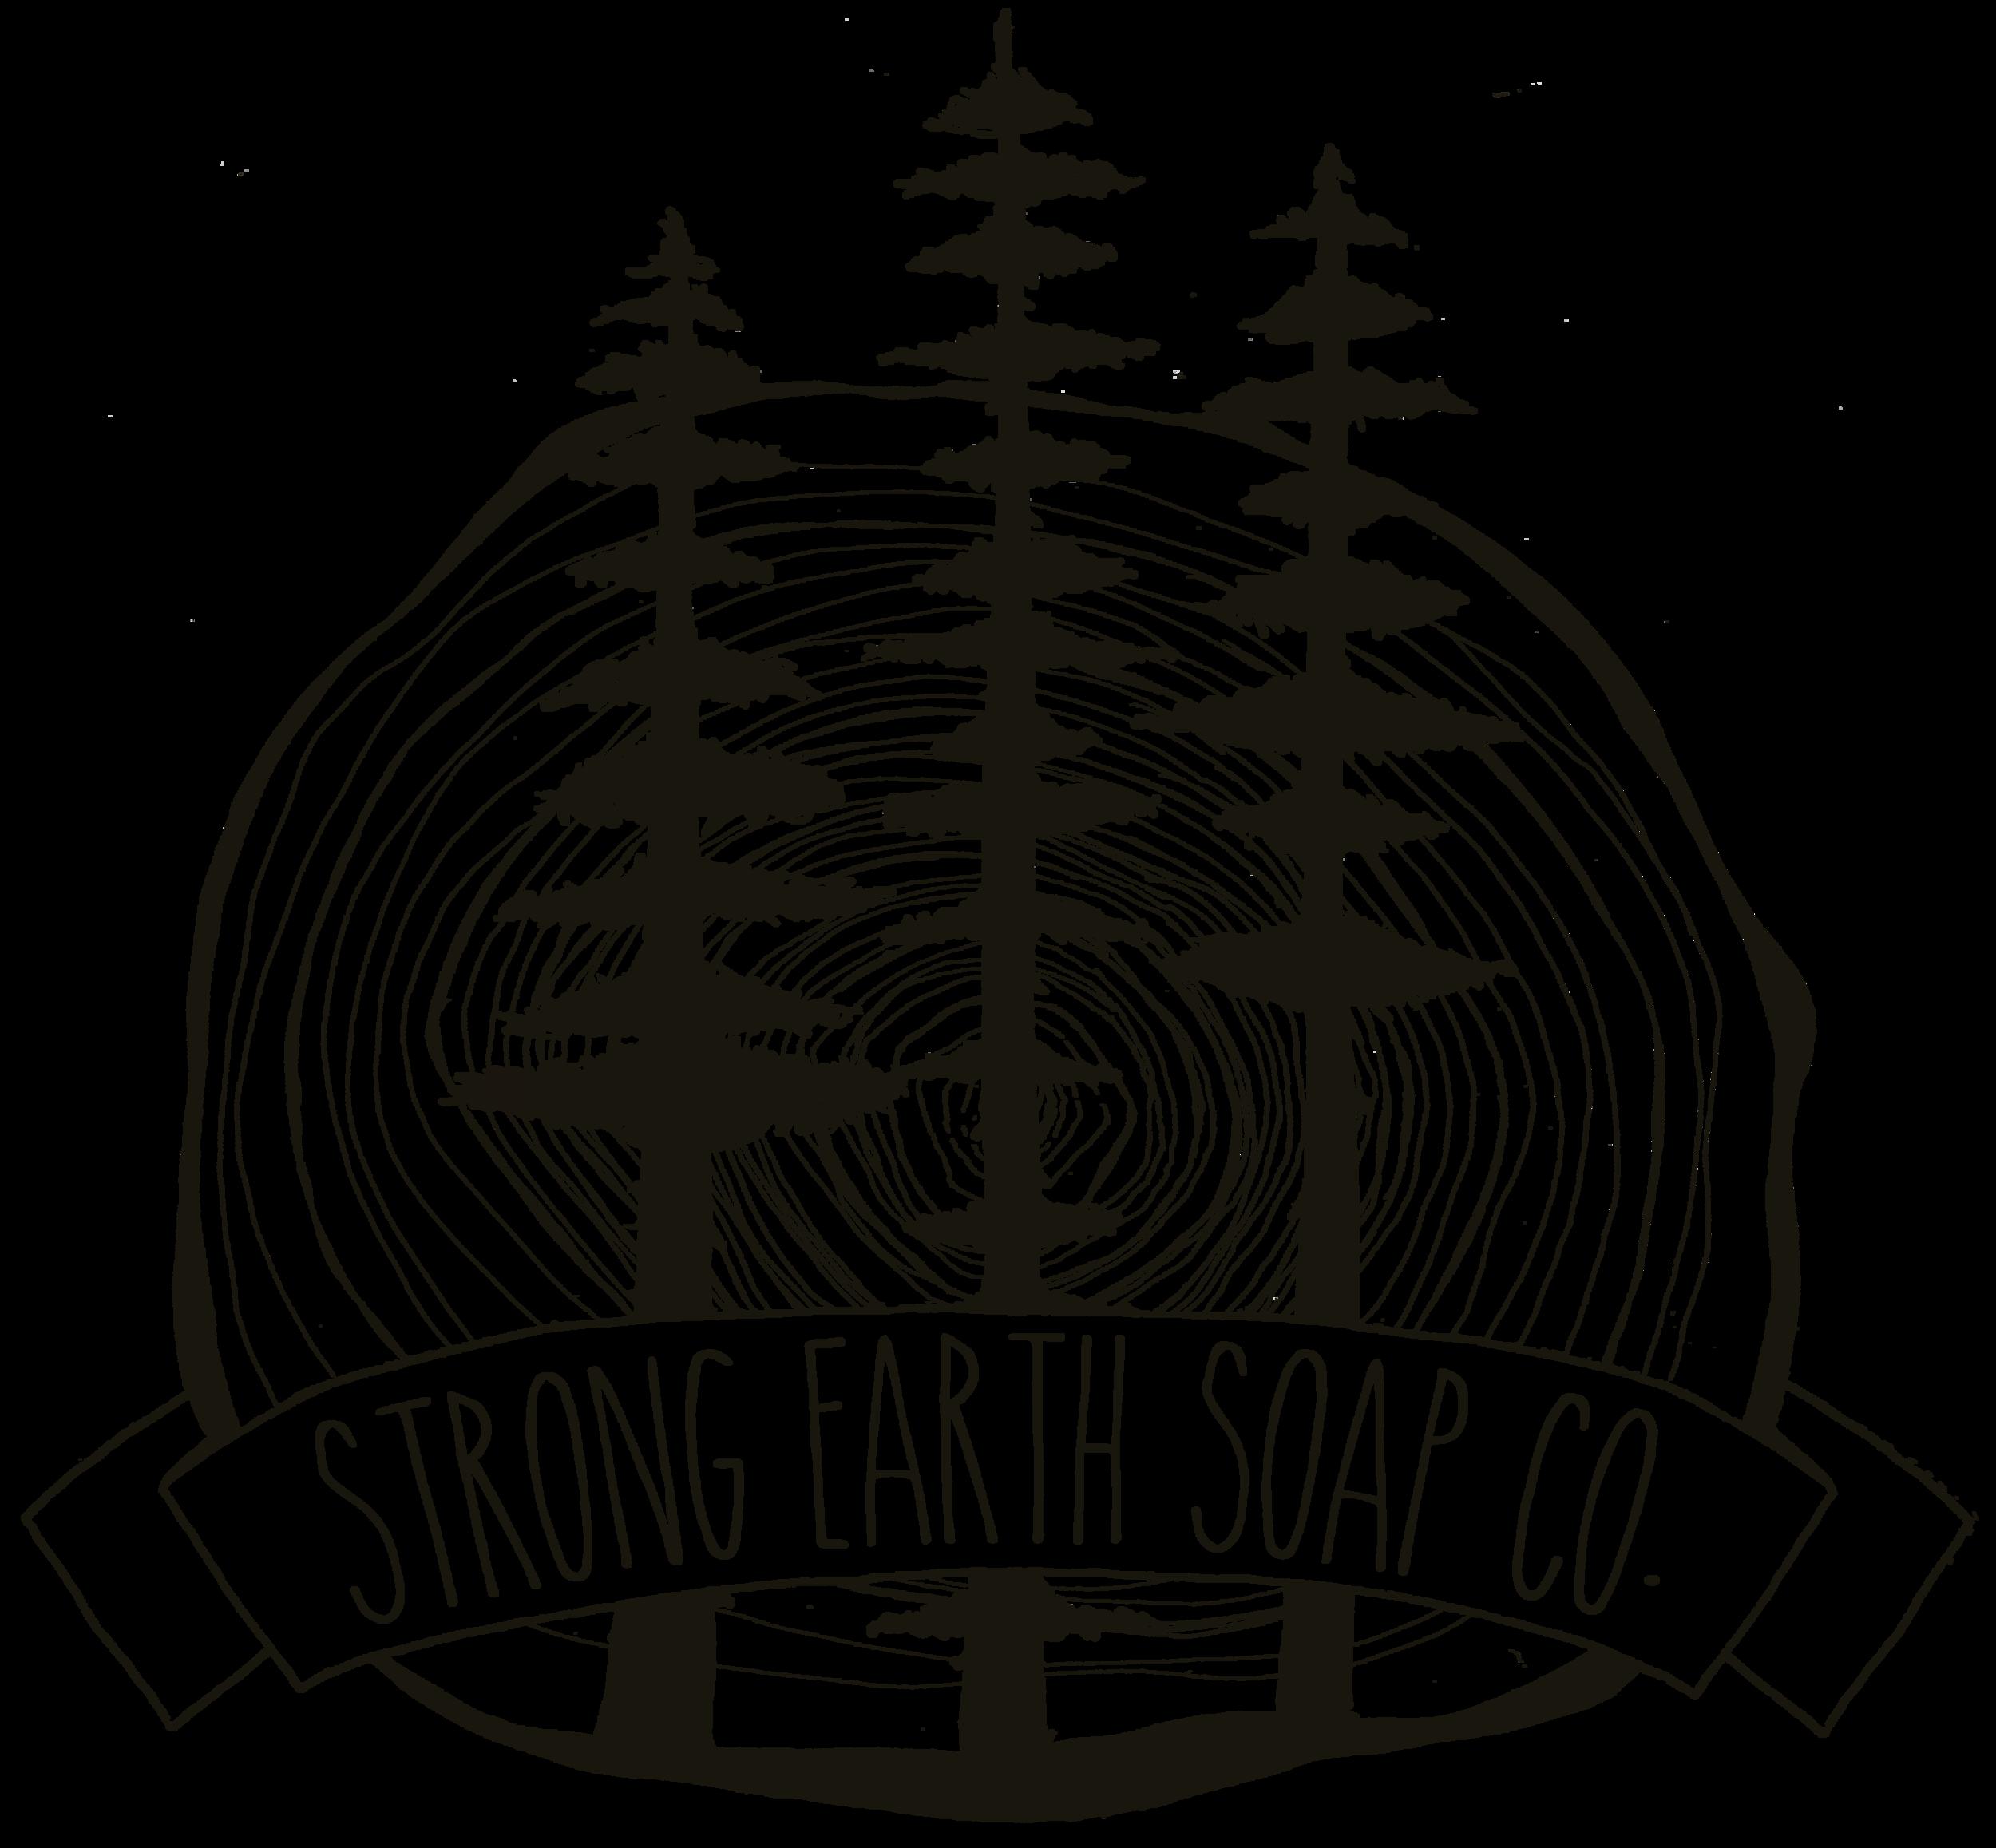 logo large with border.jpg